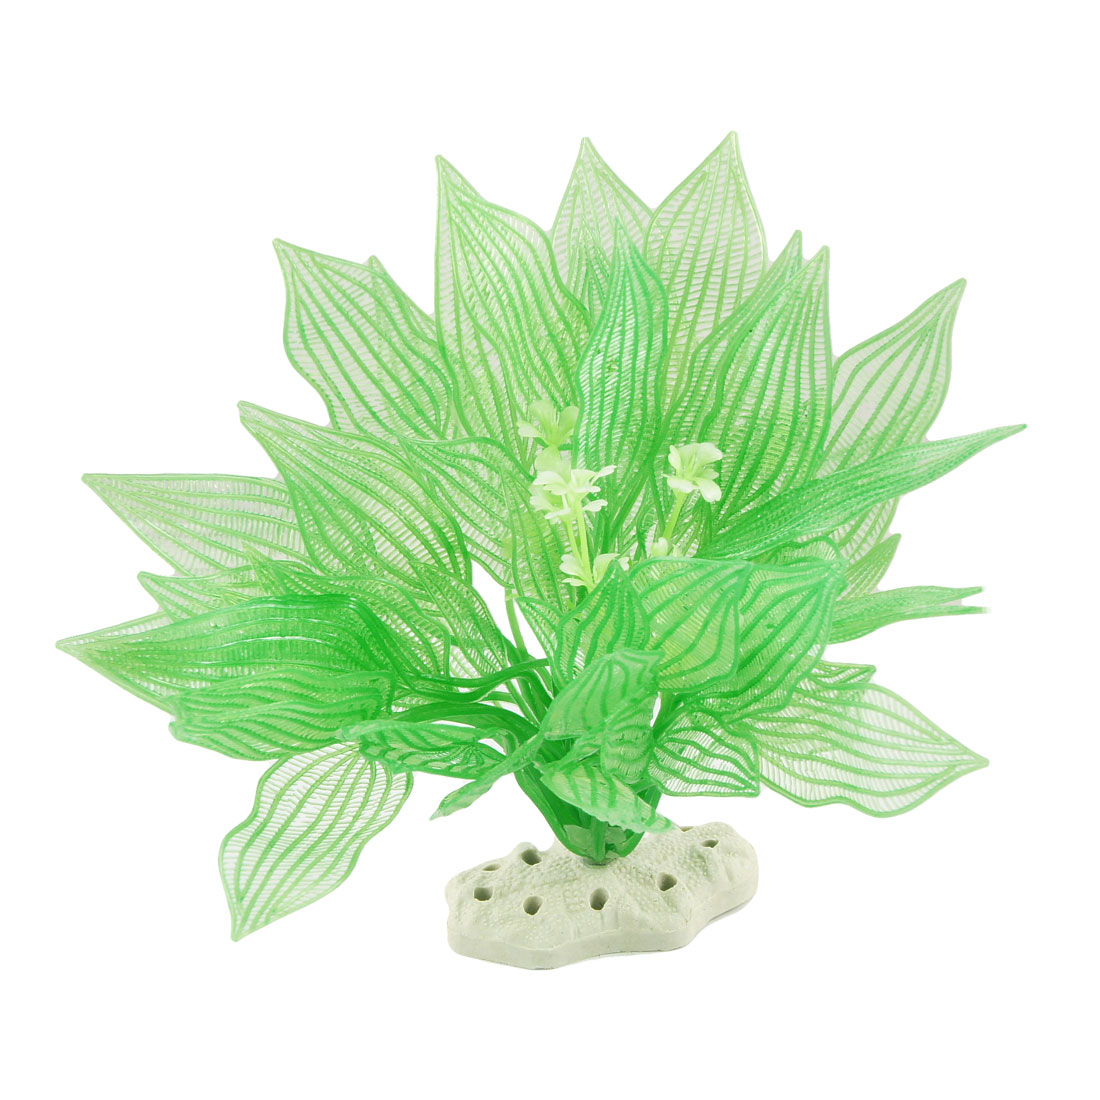 "Fish Tank Green Plastic Emulational Plant Grass Decor 8"""